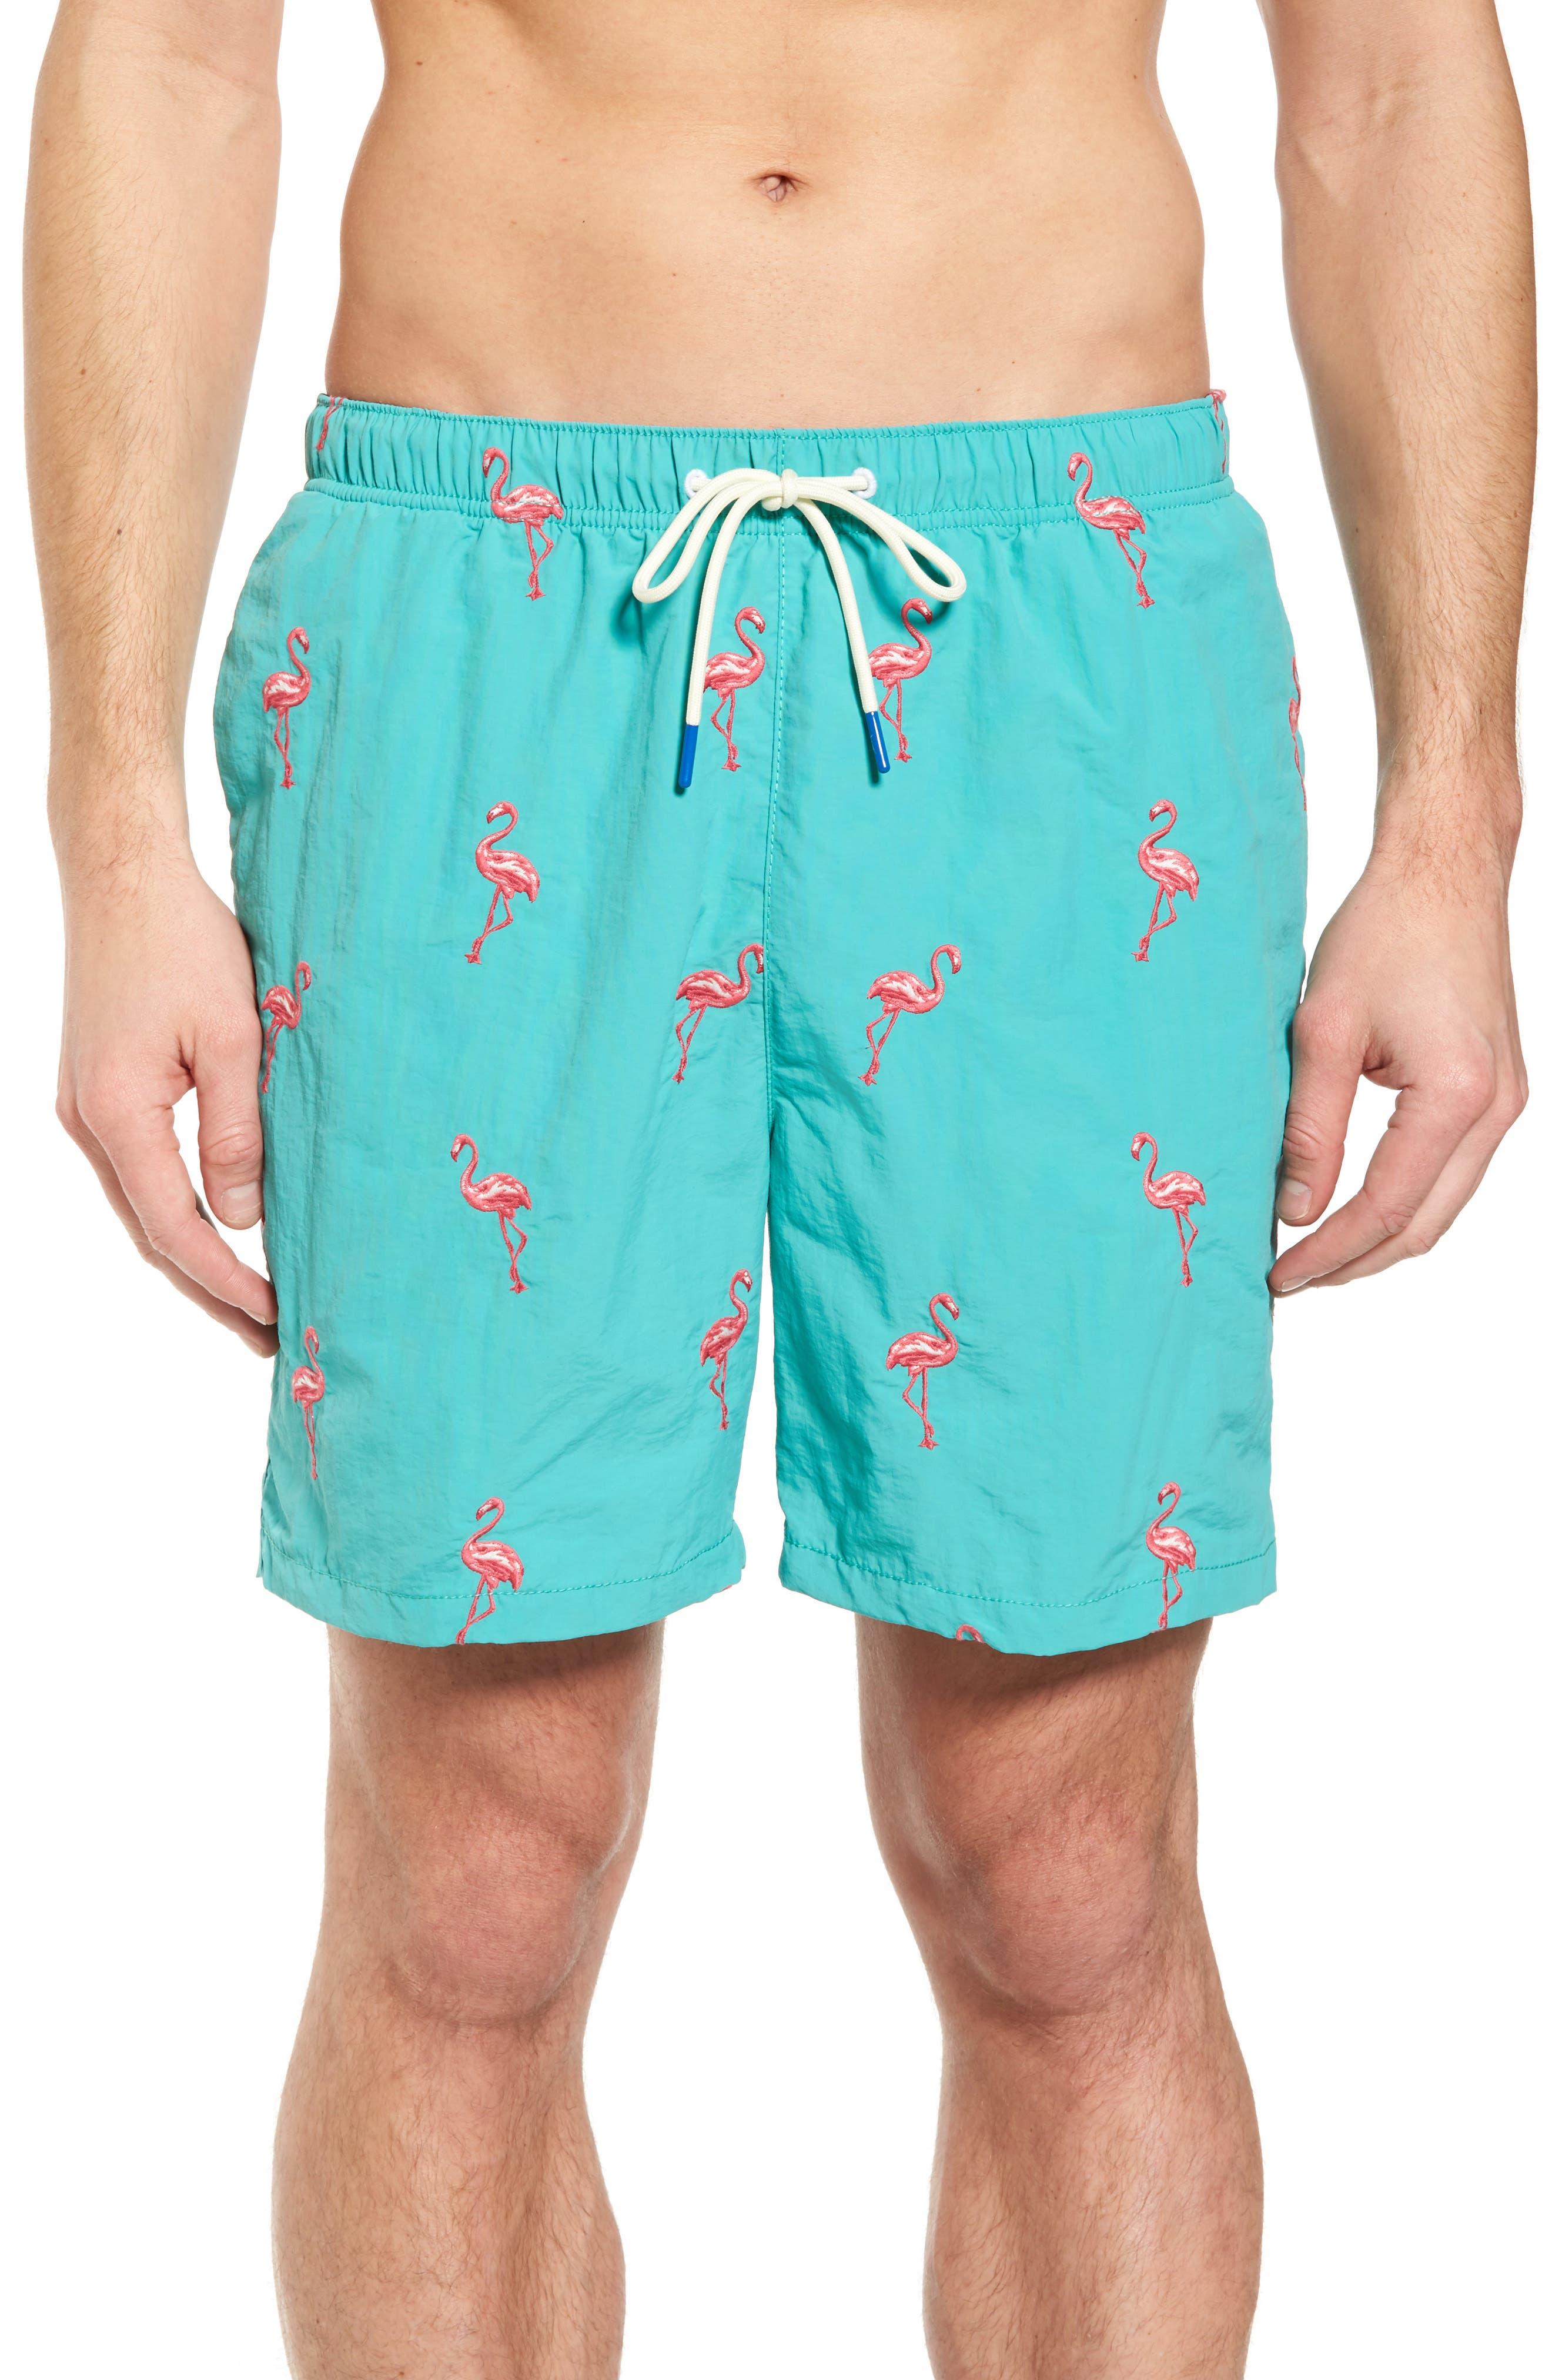 Naples Flamingo Coast Swim Trunks,                             Main thumbnail 1, color,                             Castaway Green